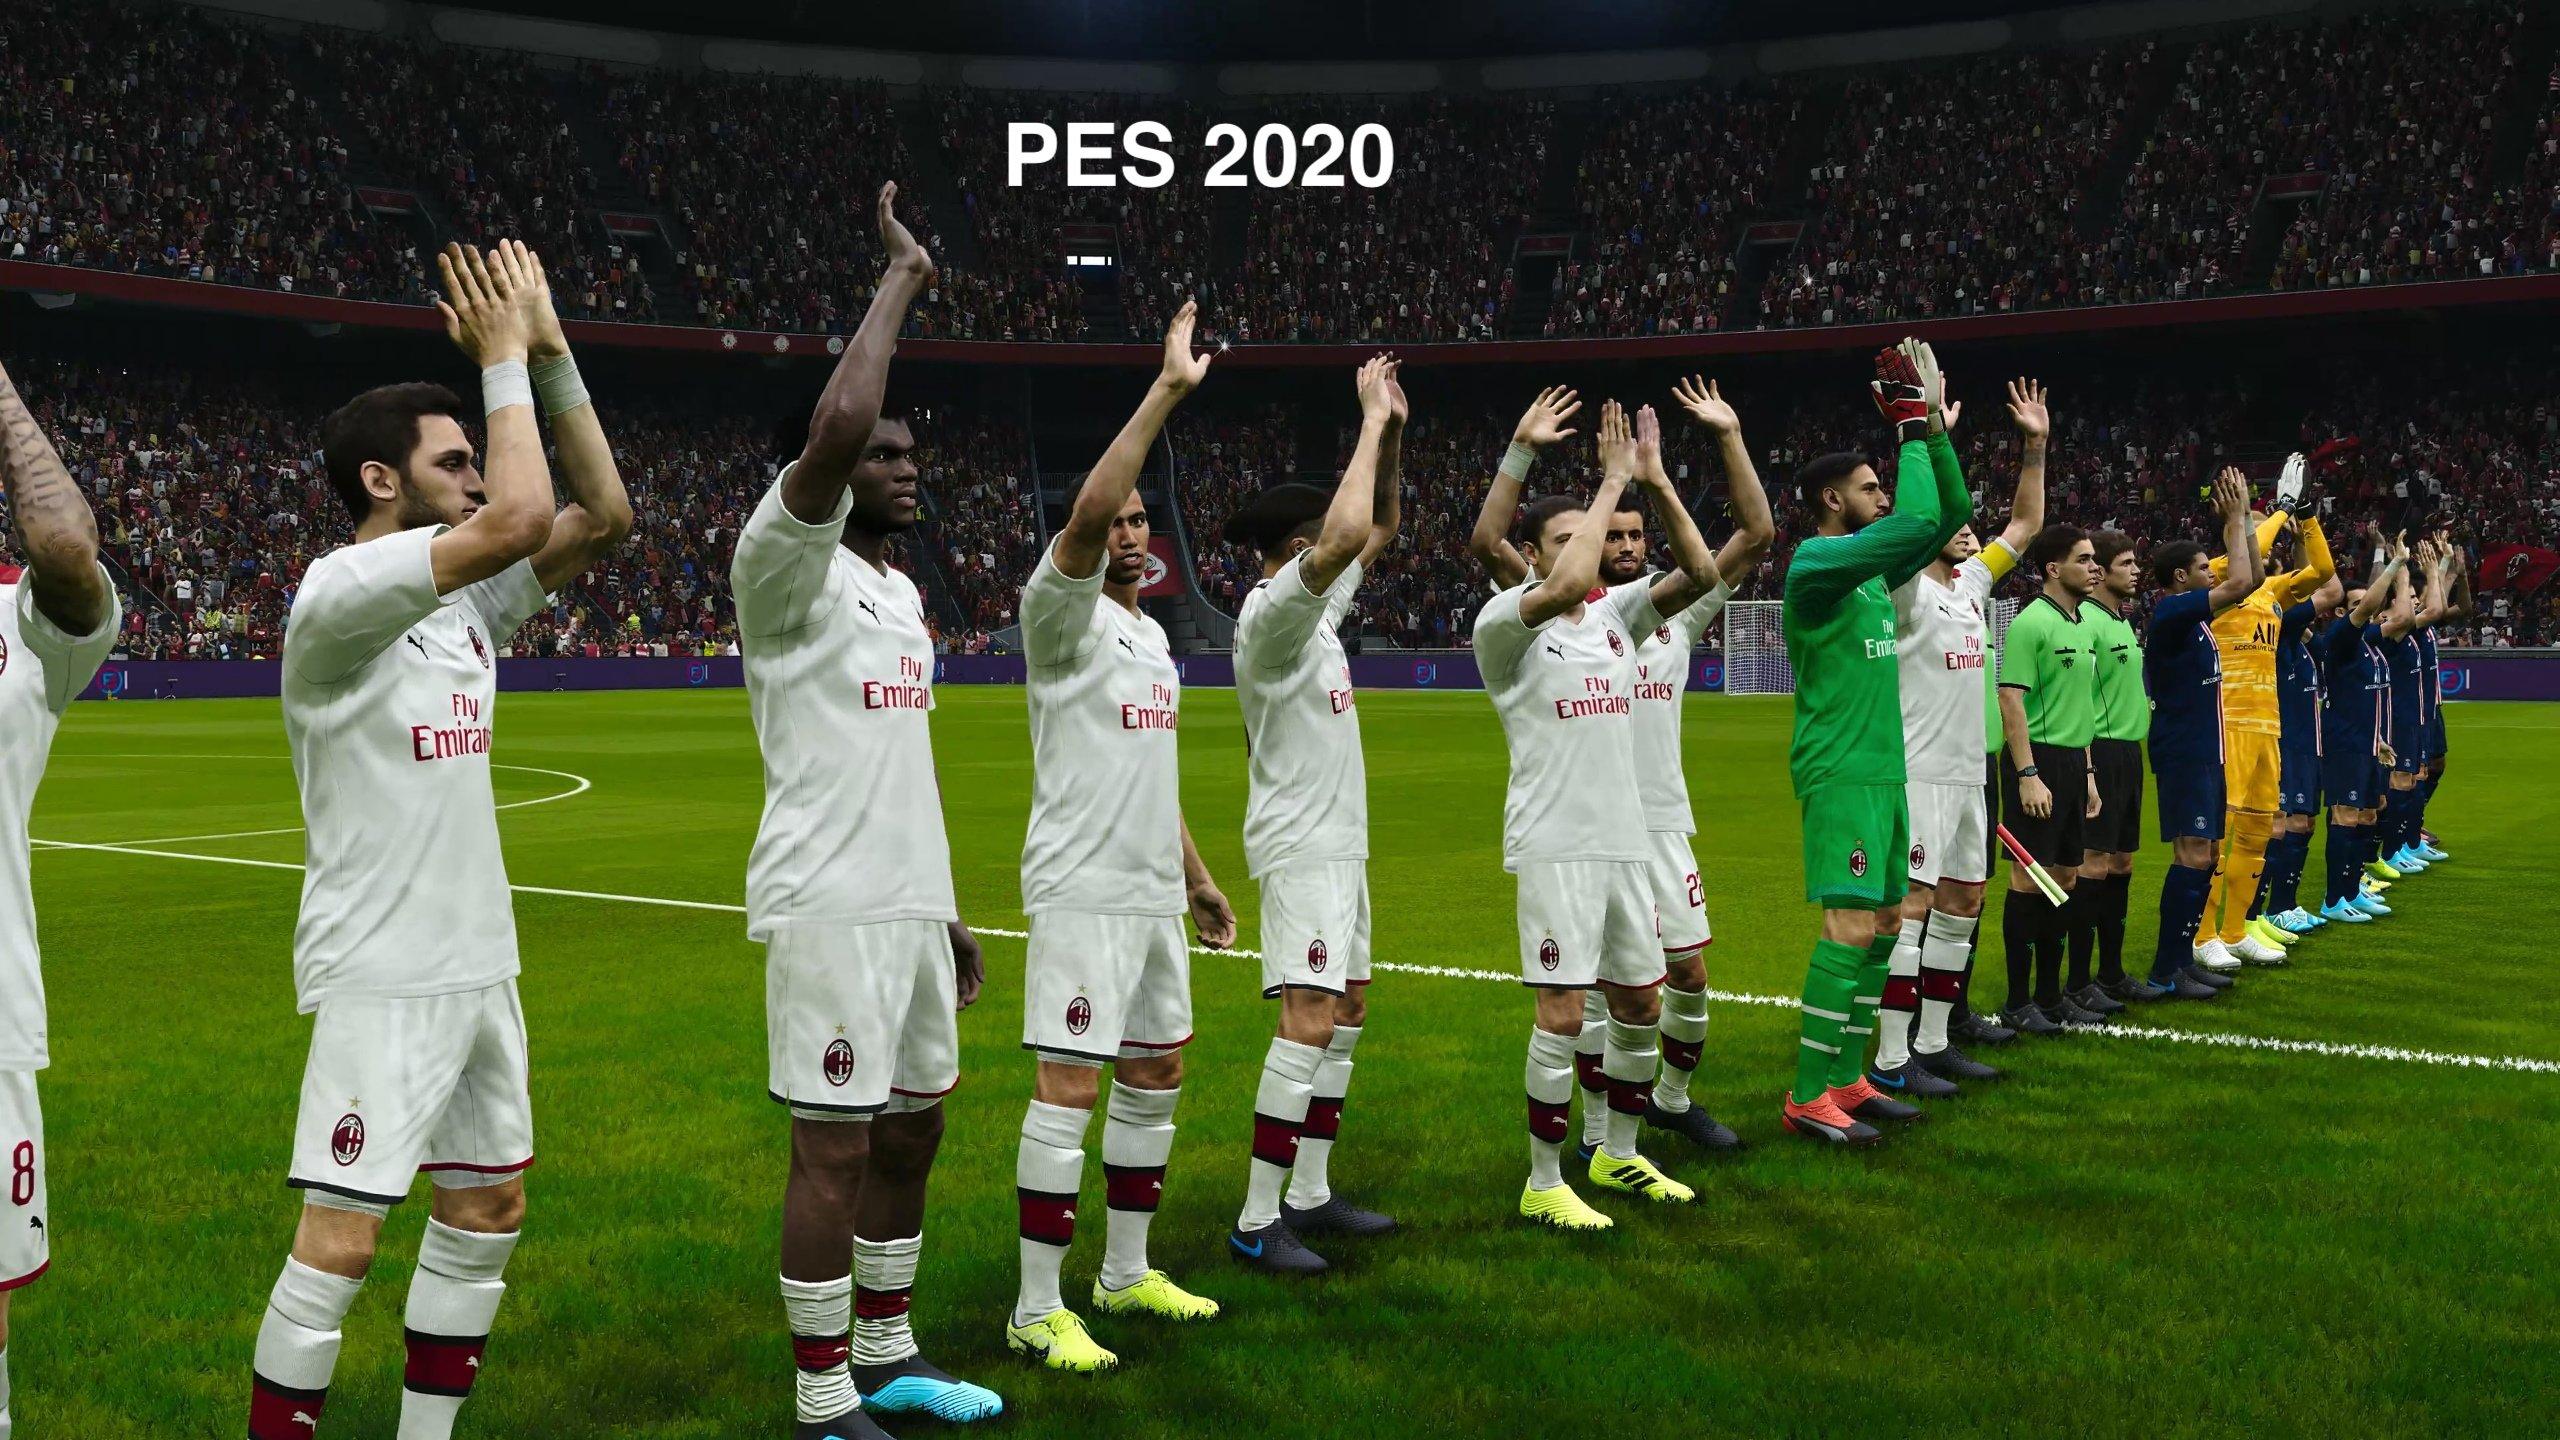 efootball-pes-2020-presentation